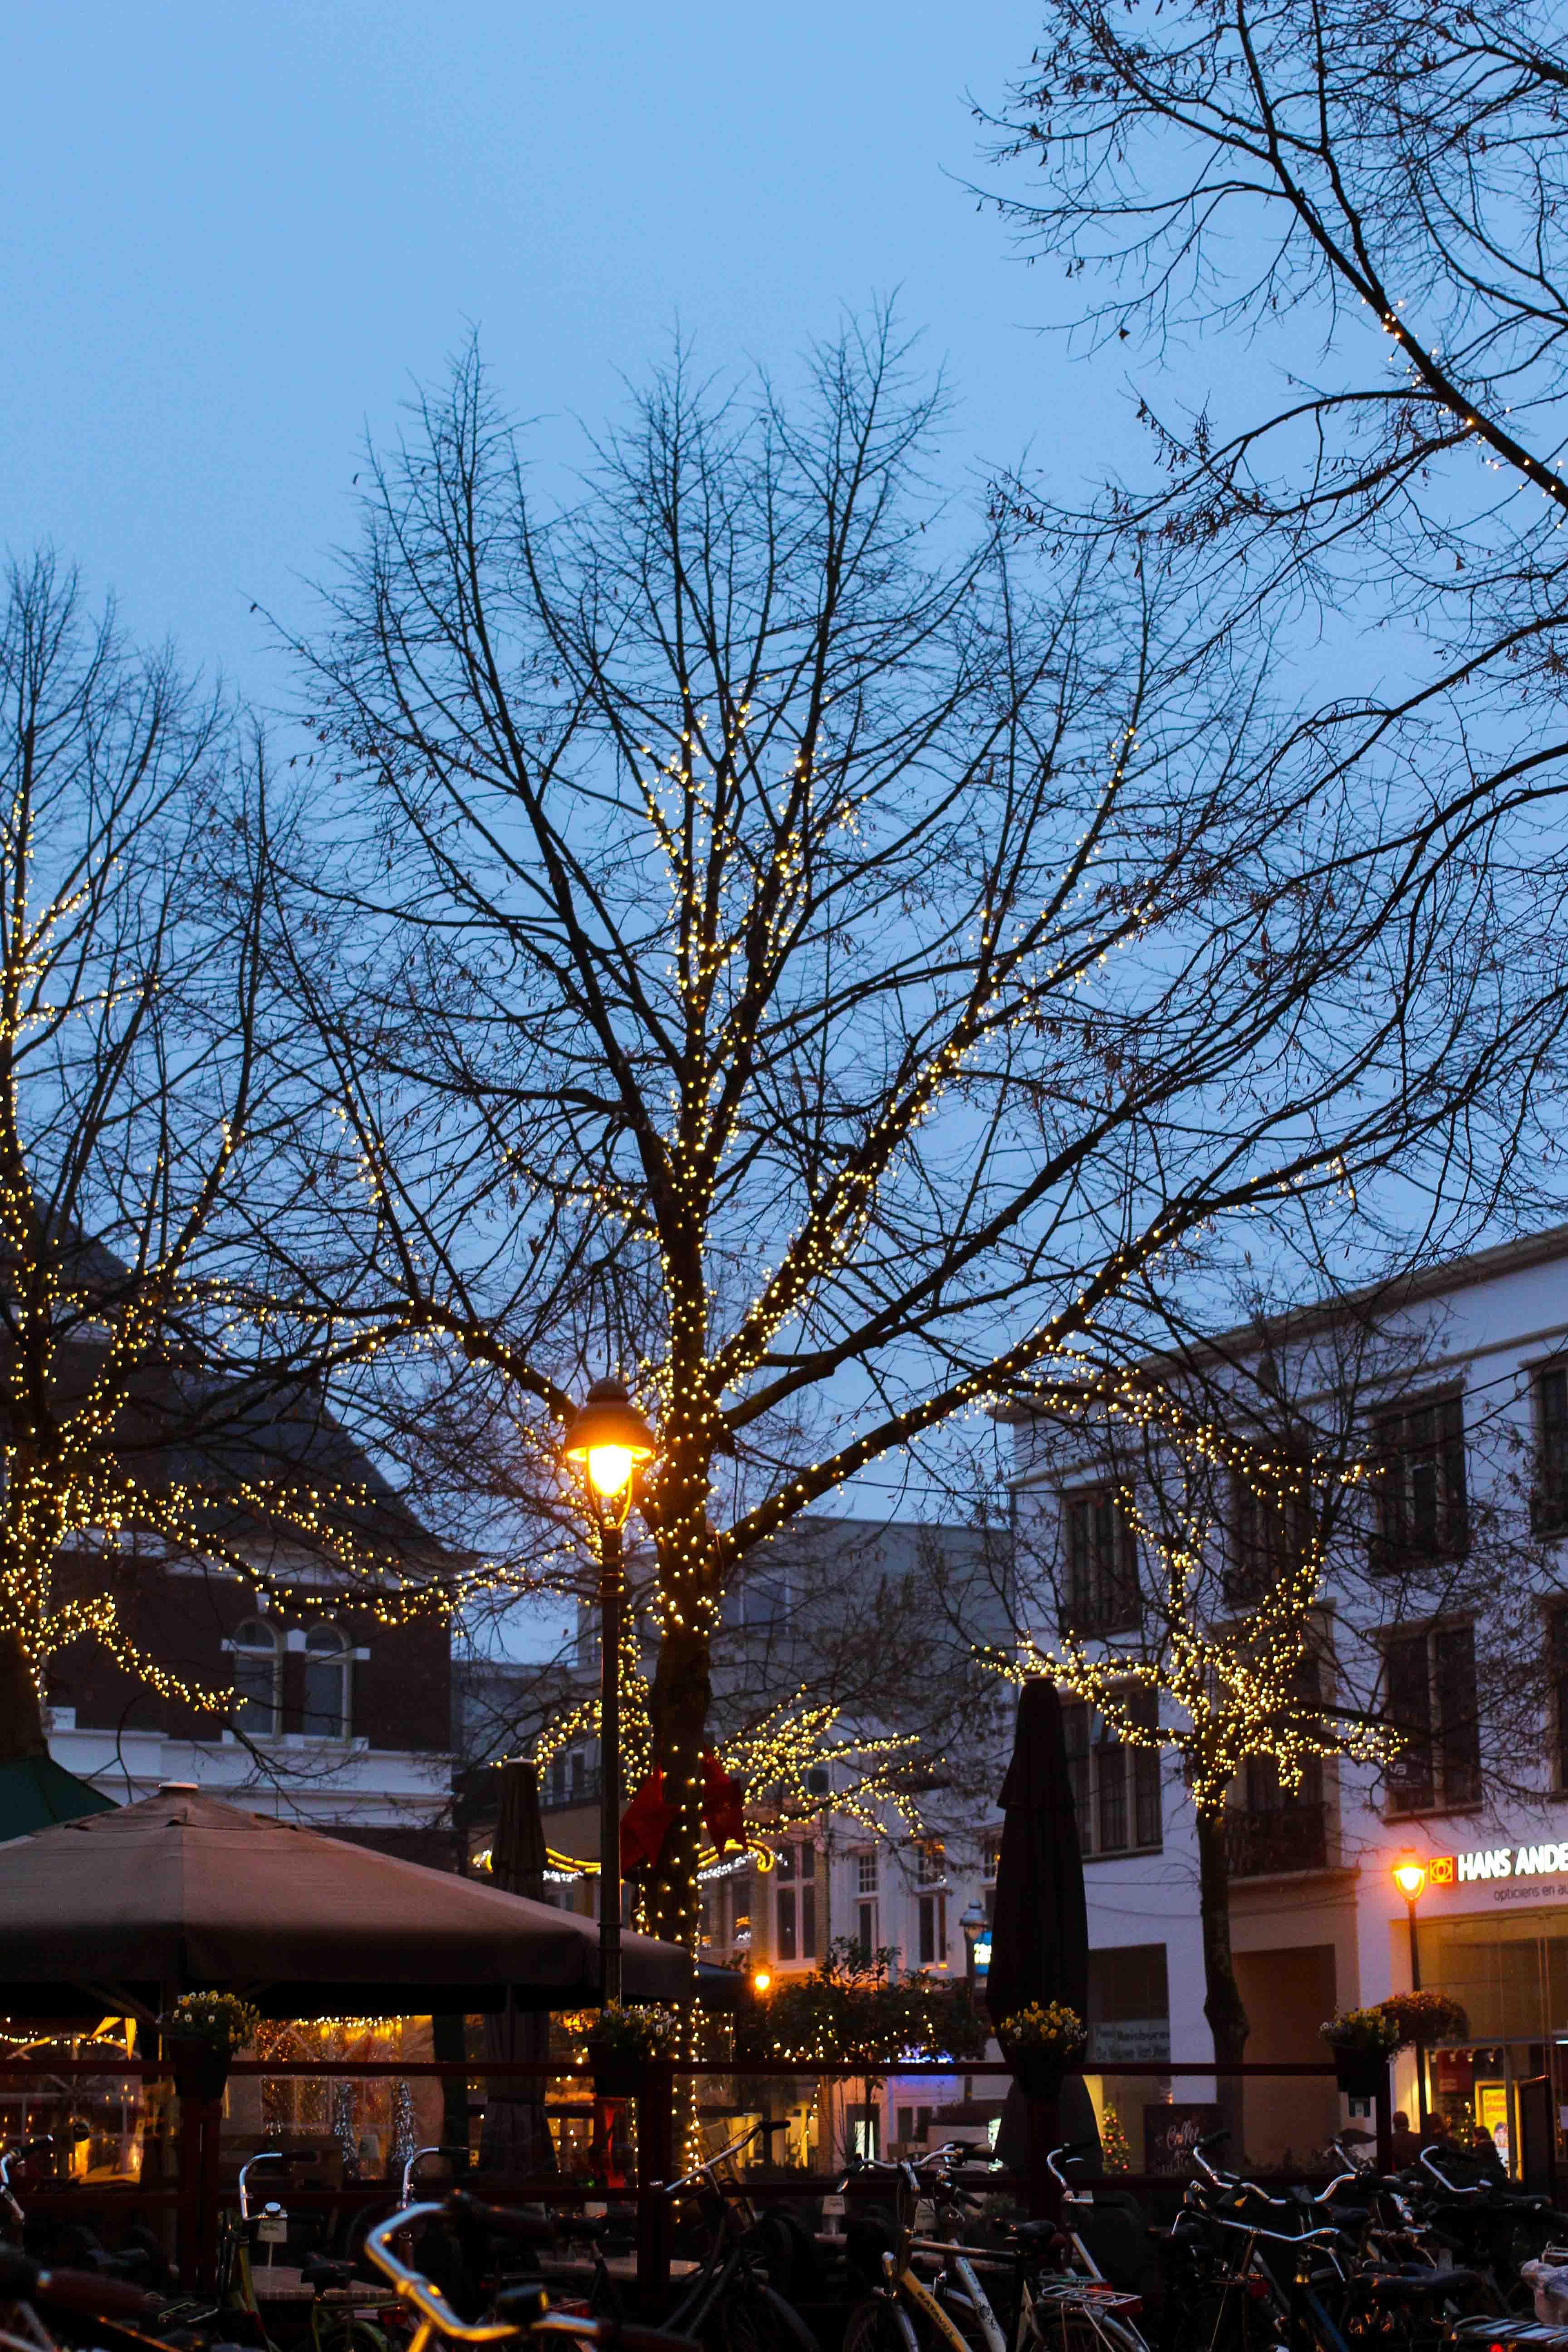 Wochenendtrip das andere Holland Kurztrip Apeldoorn Winterfair Holzbuden Ausflugsziel Holland Winterbeleuchtung